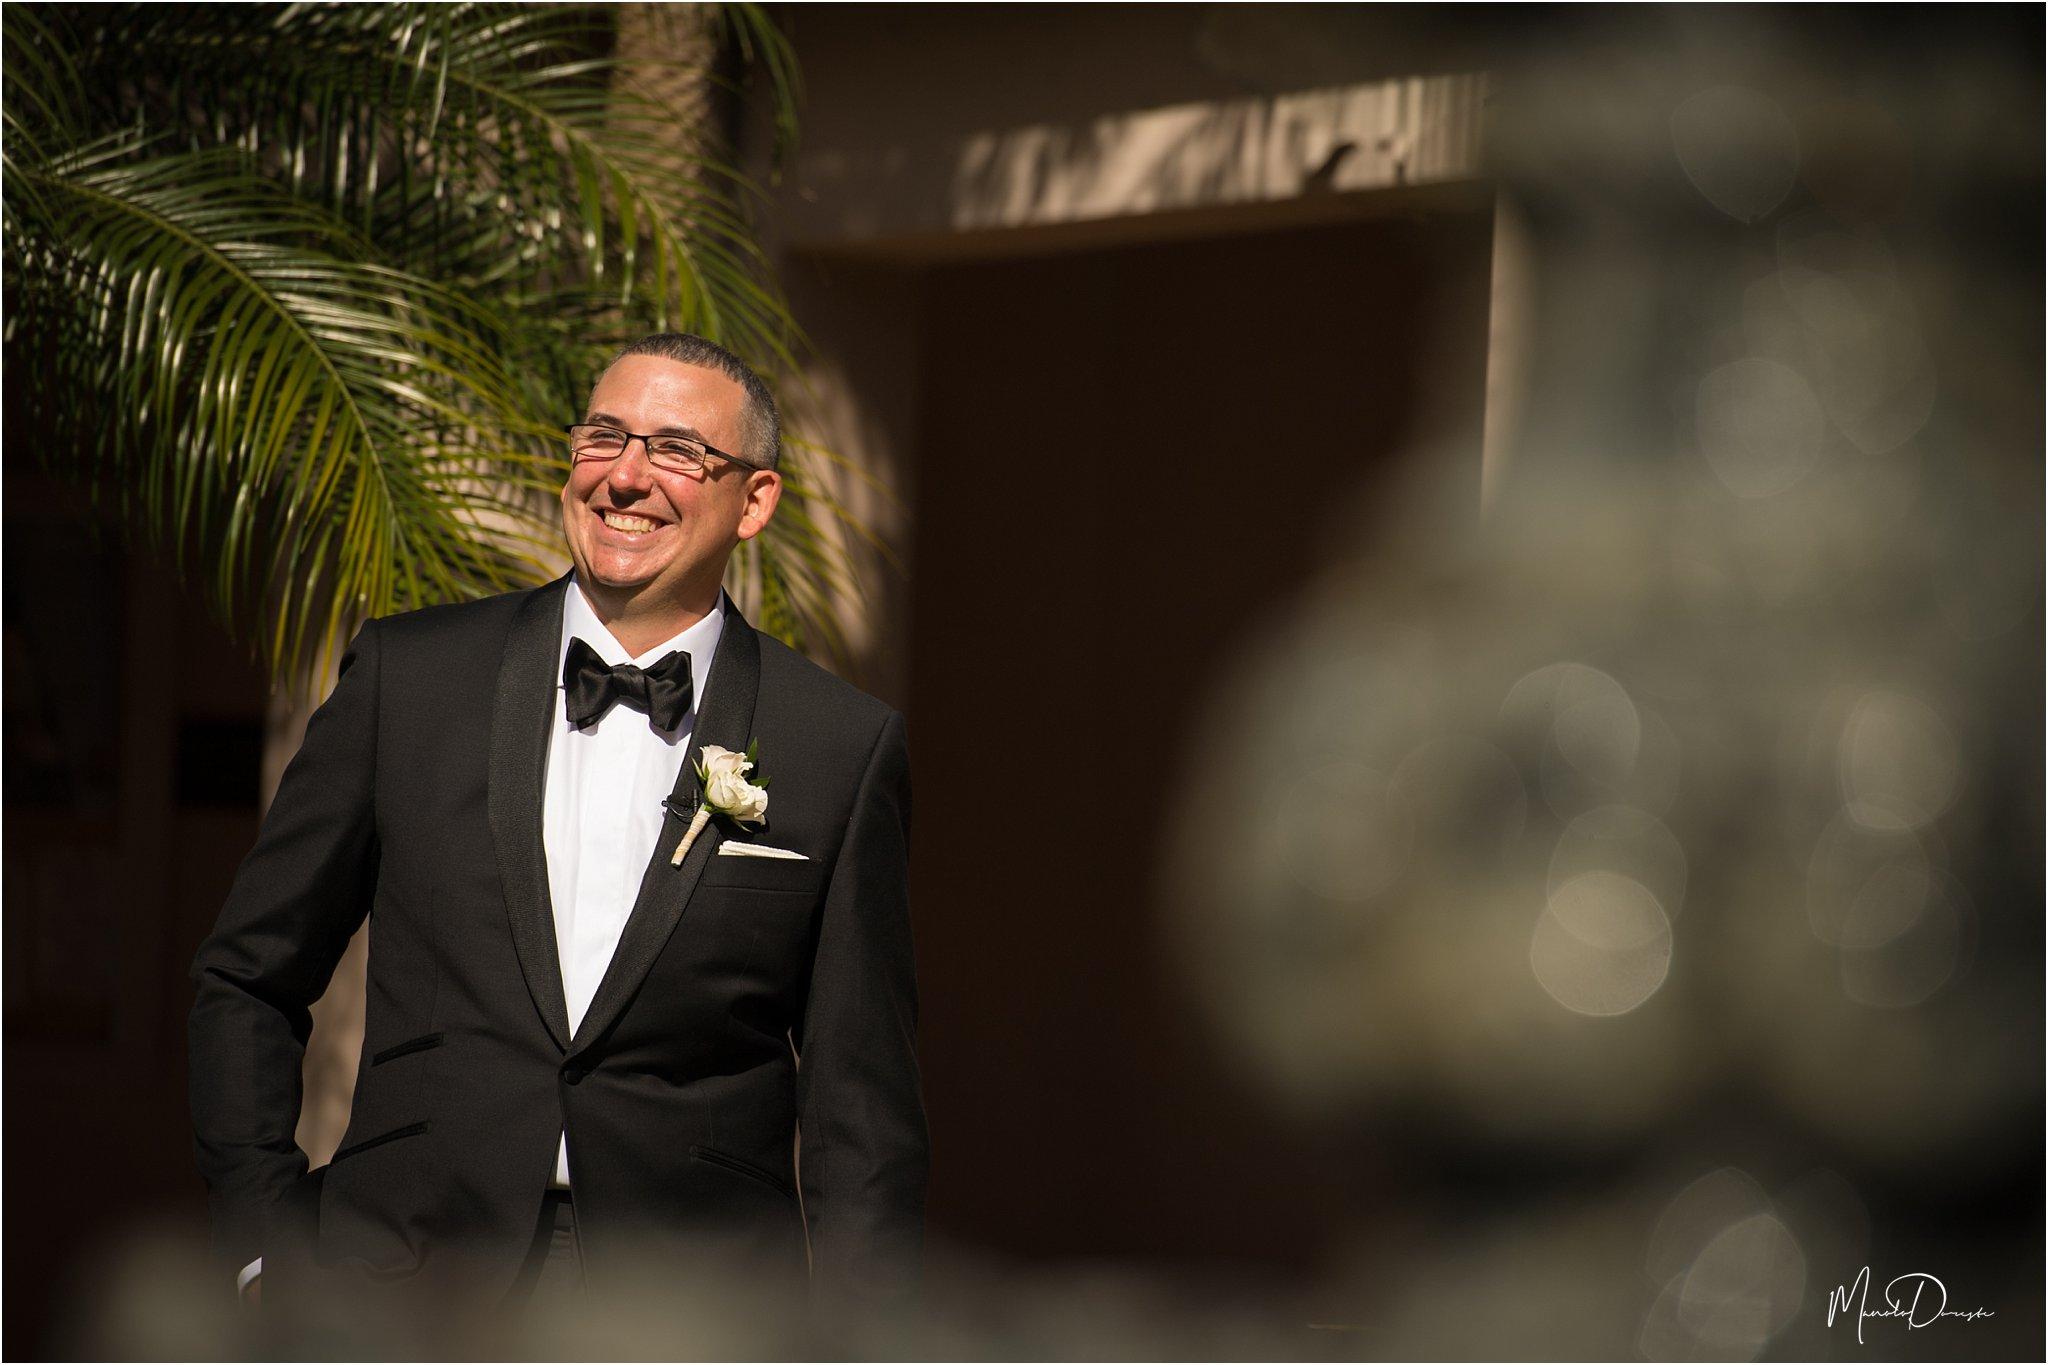 00716_ManoloDoreste_InFocusStudios_Wedding_Family_Photography_Miami_MiamiPhotographer.jpg